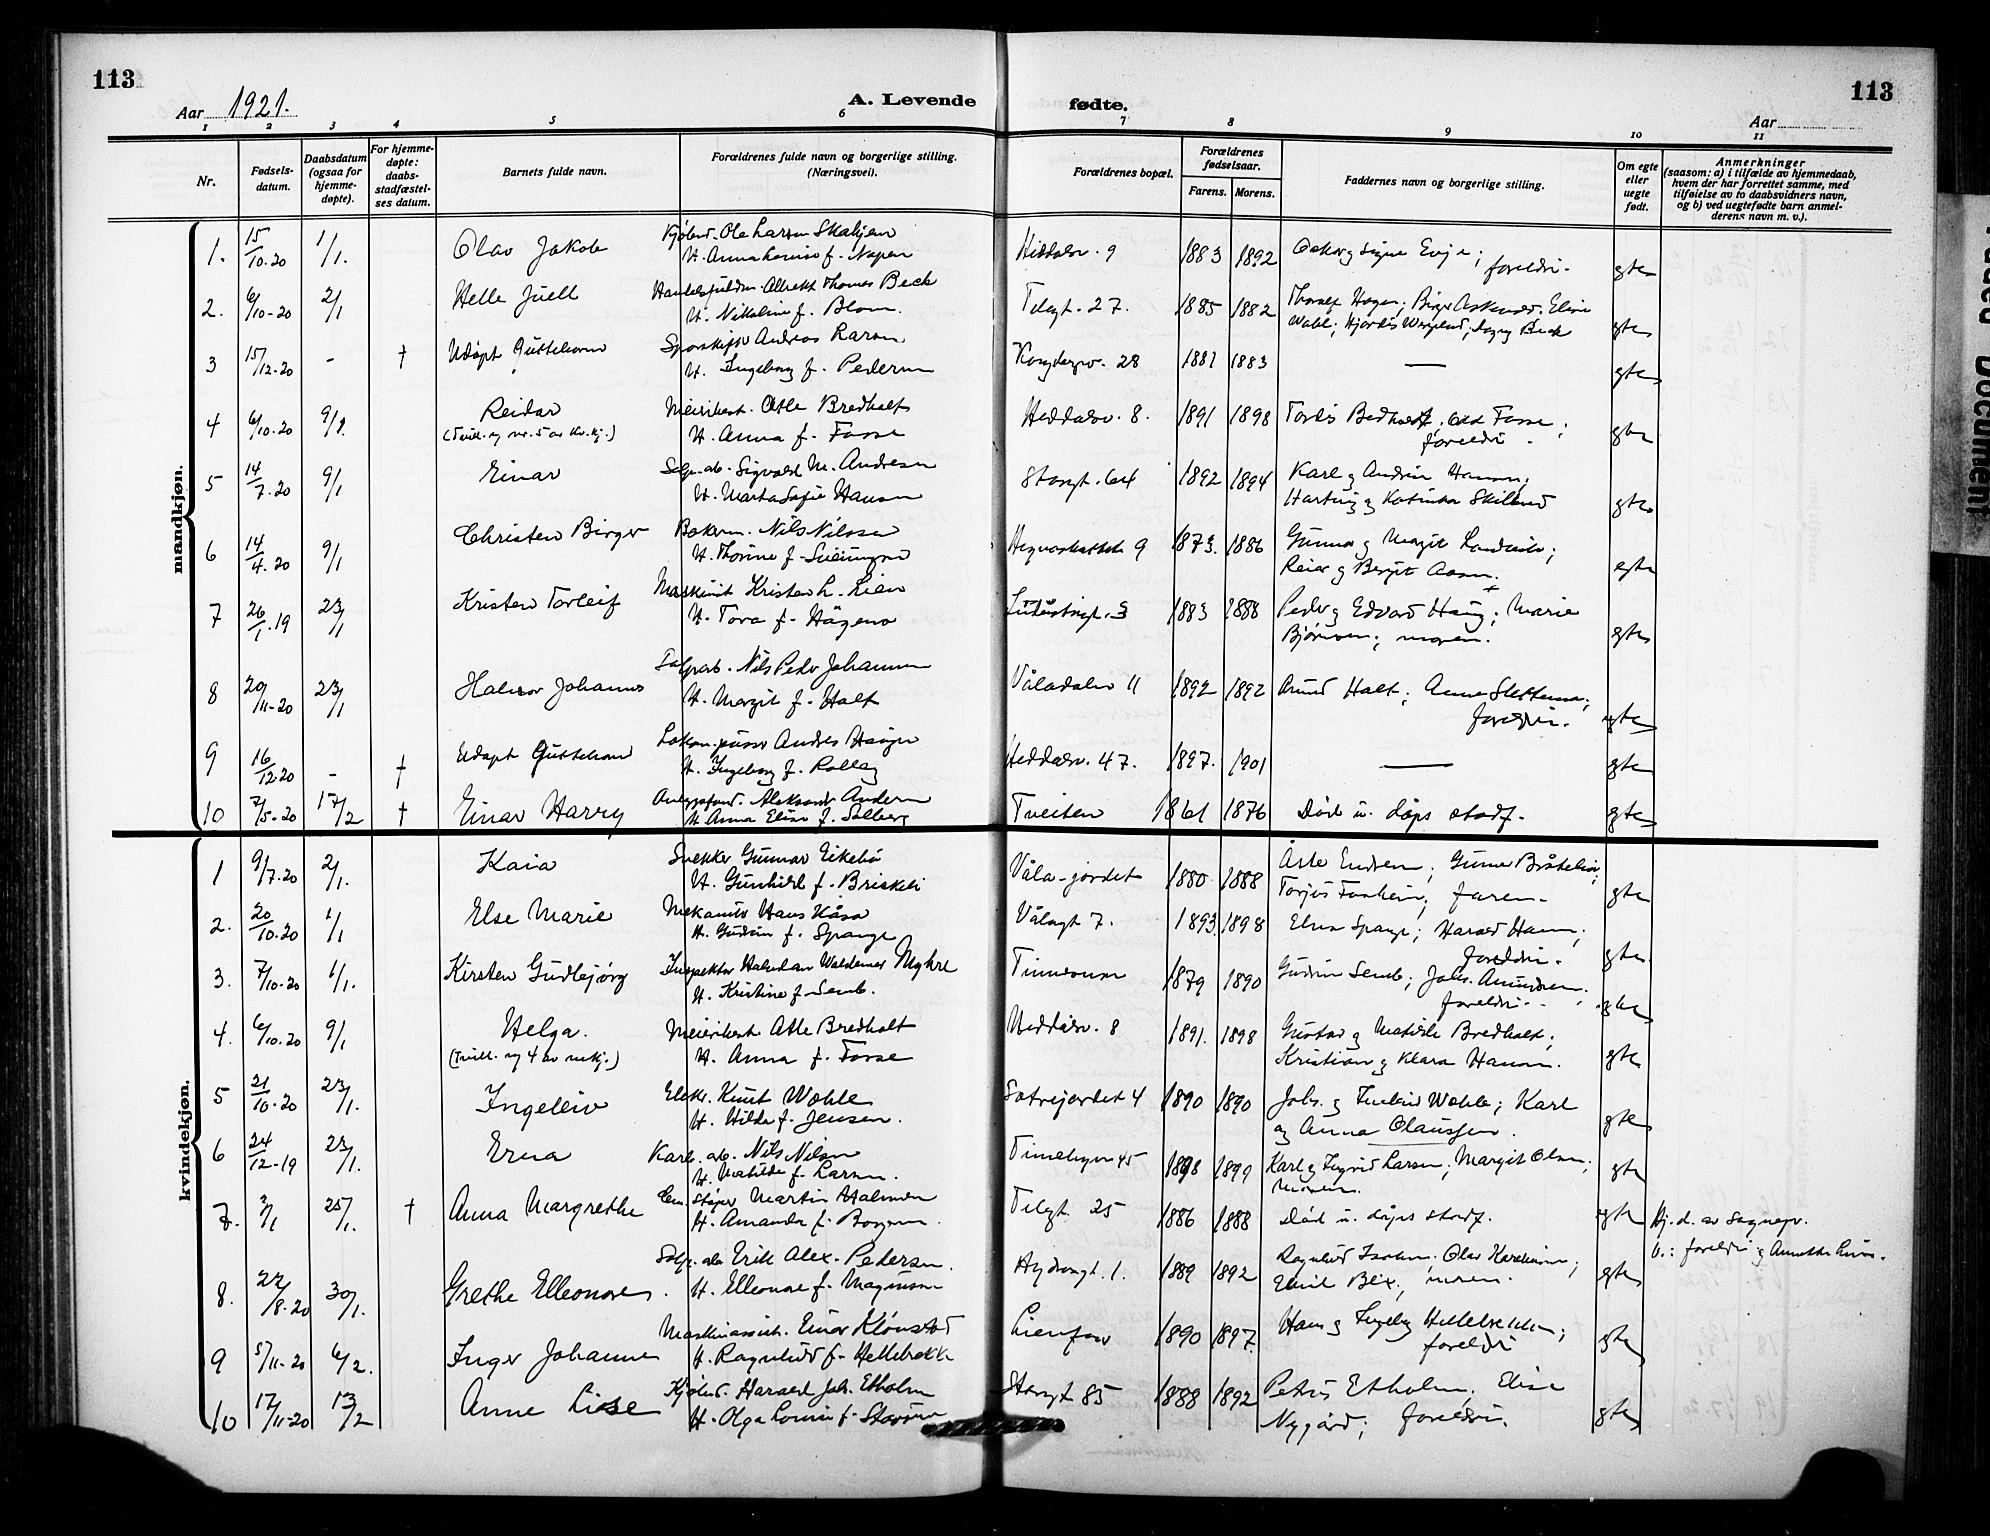 SAKO, Notodden kirkebøker, G/Ga/L0001: Klokkerbok nr. 1, 1912-1923, s. 113